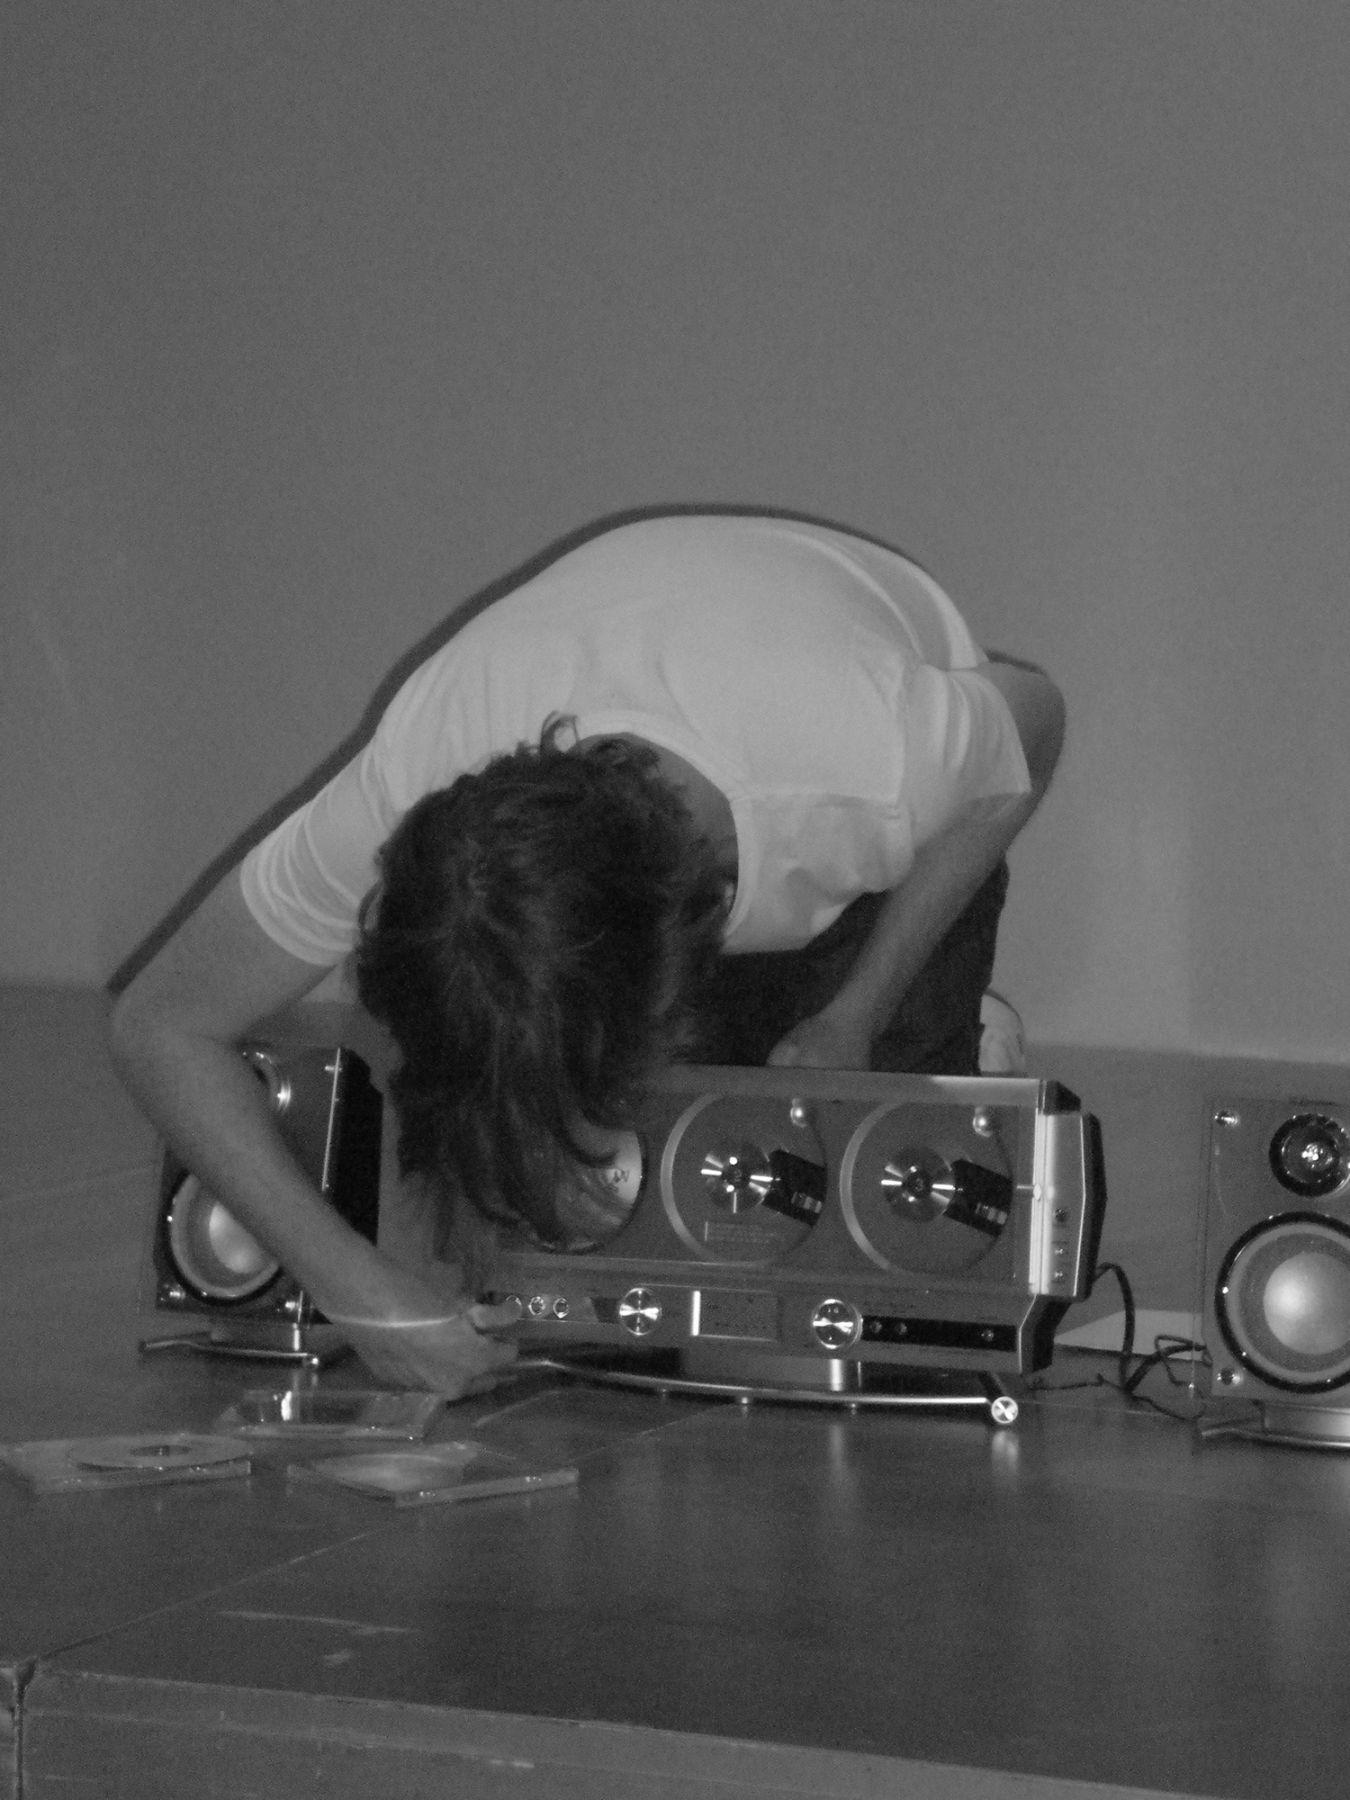 Cory Arcangel, Performance view, Music for Stereos, Hamburger Bahnhof, Berlin, 2010